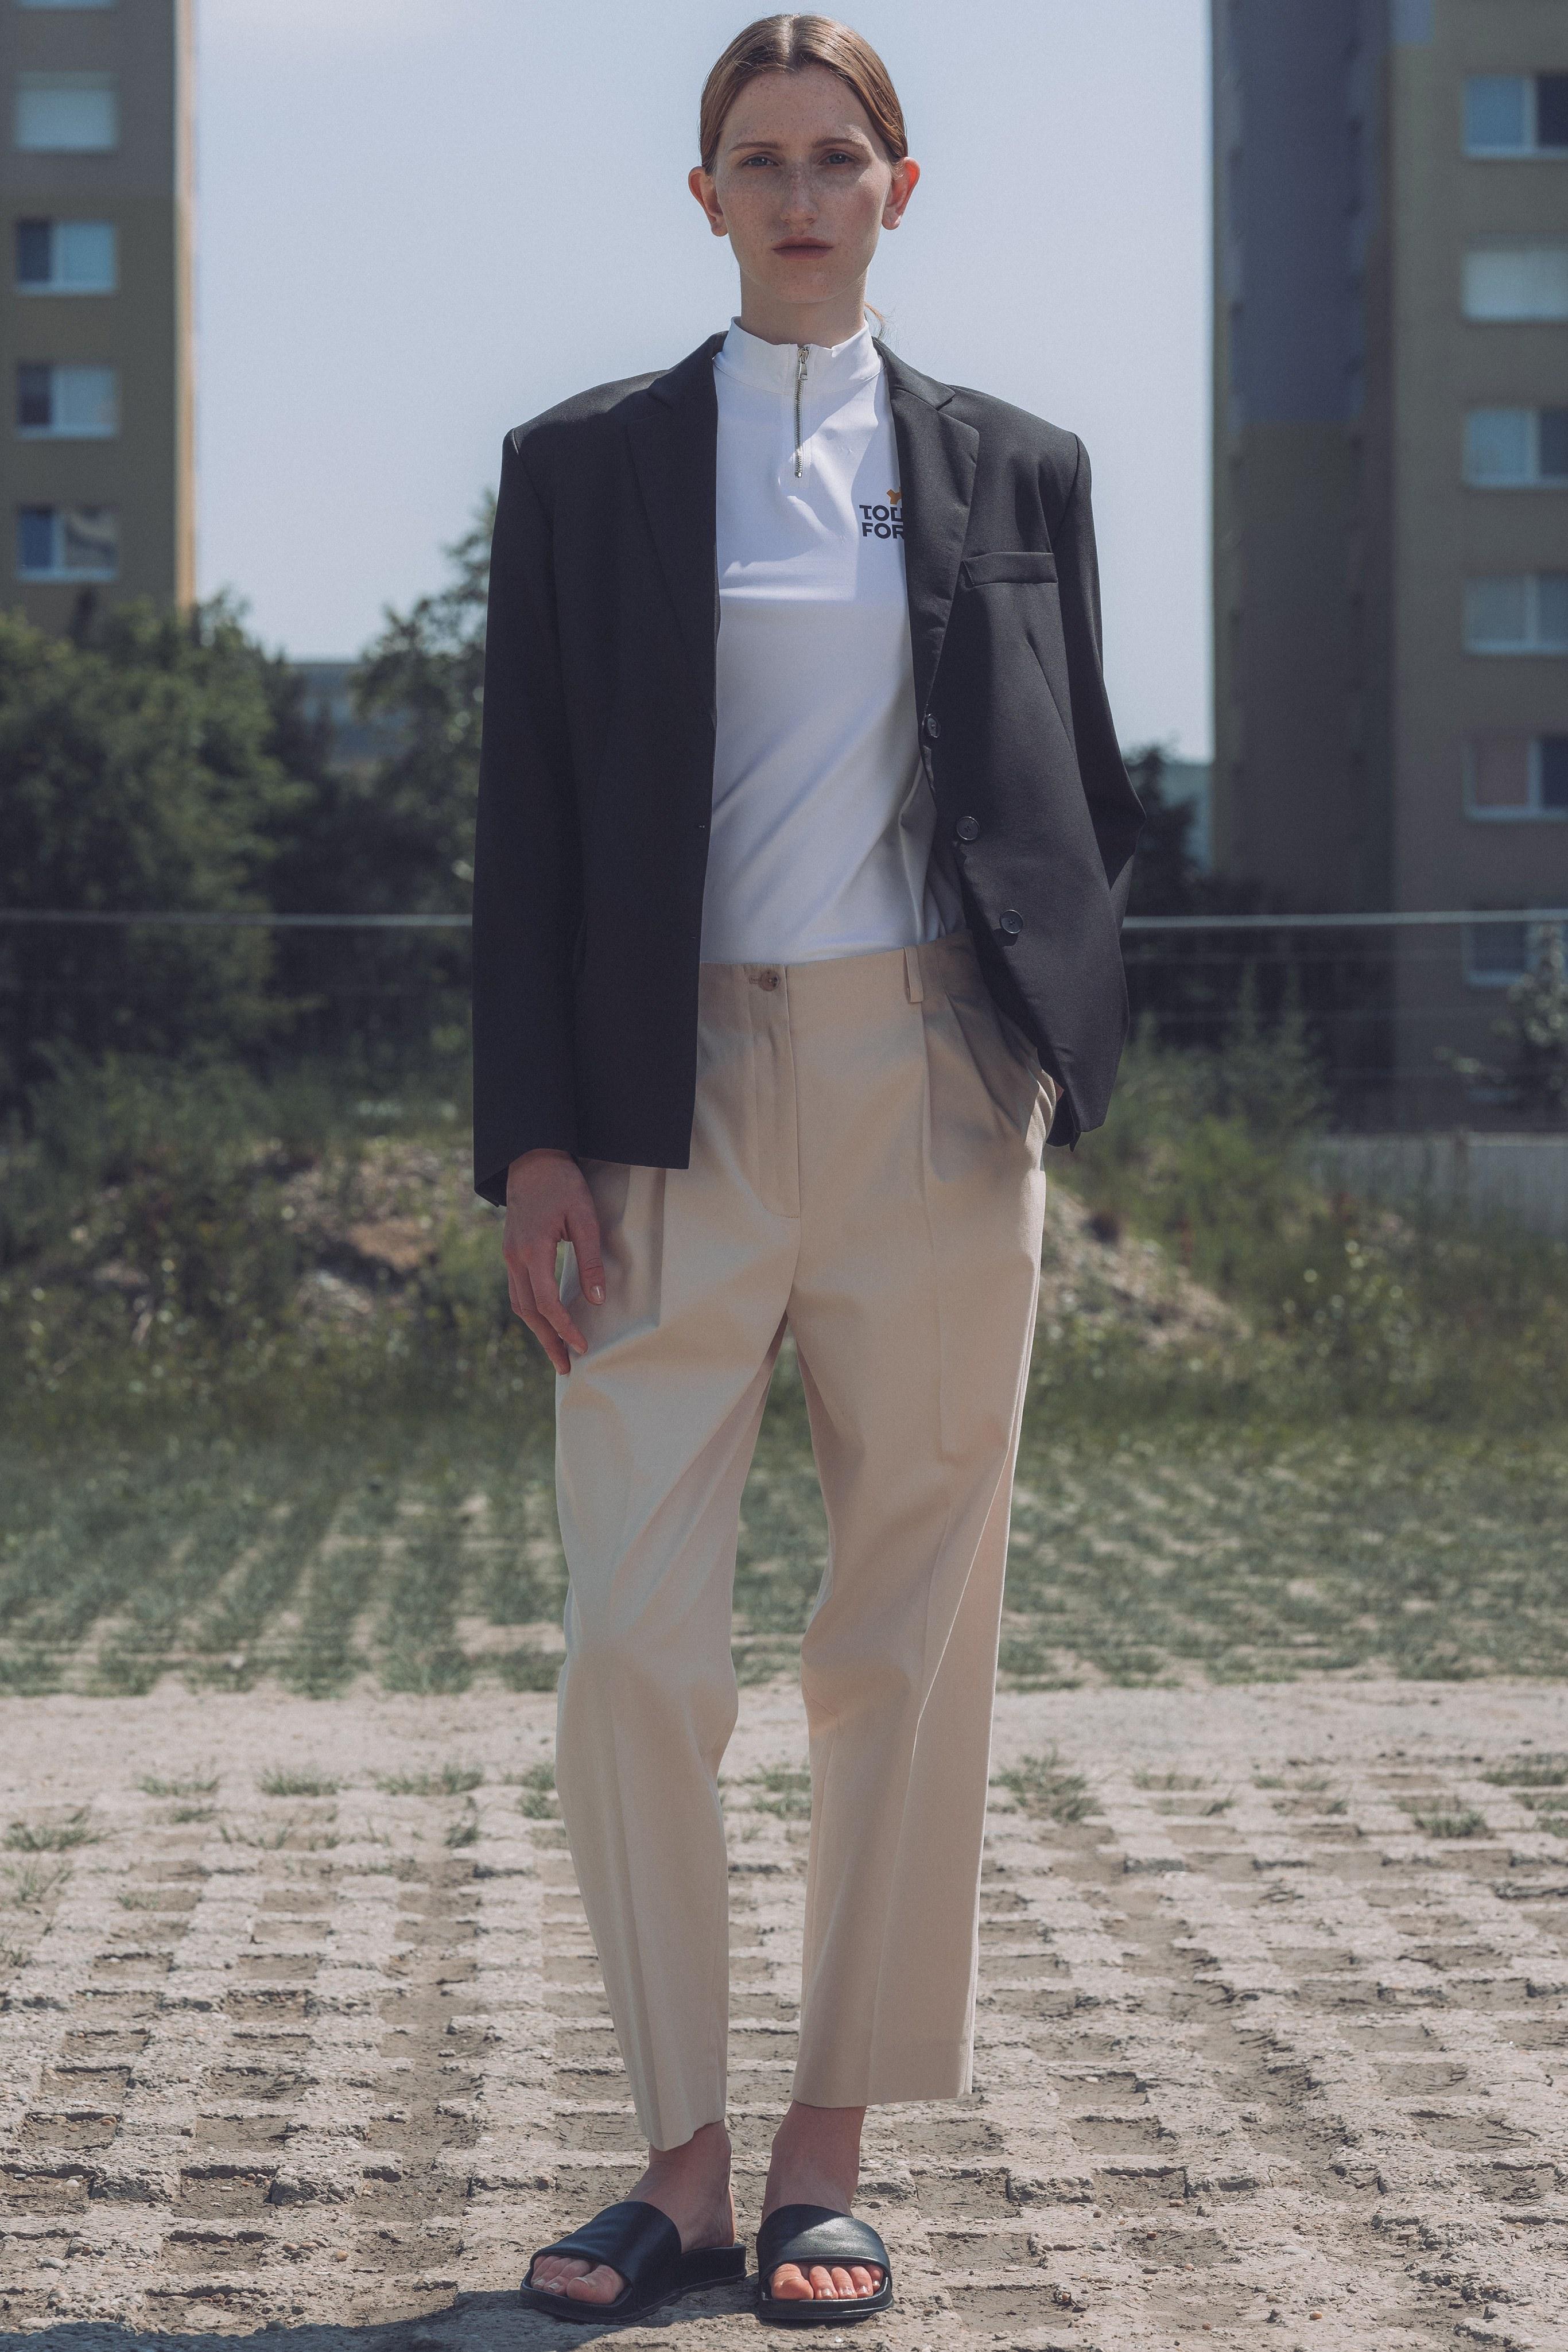 Савхин пиджак, макси юбка болон бусад дурсамж сэргээсэн 2020 оны ретро трендүүд (фото 7)